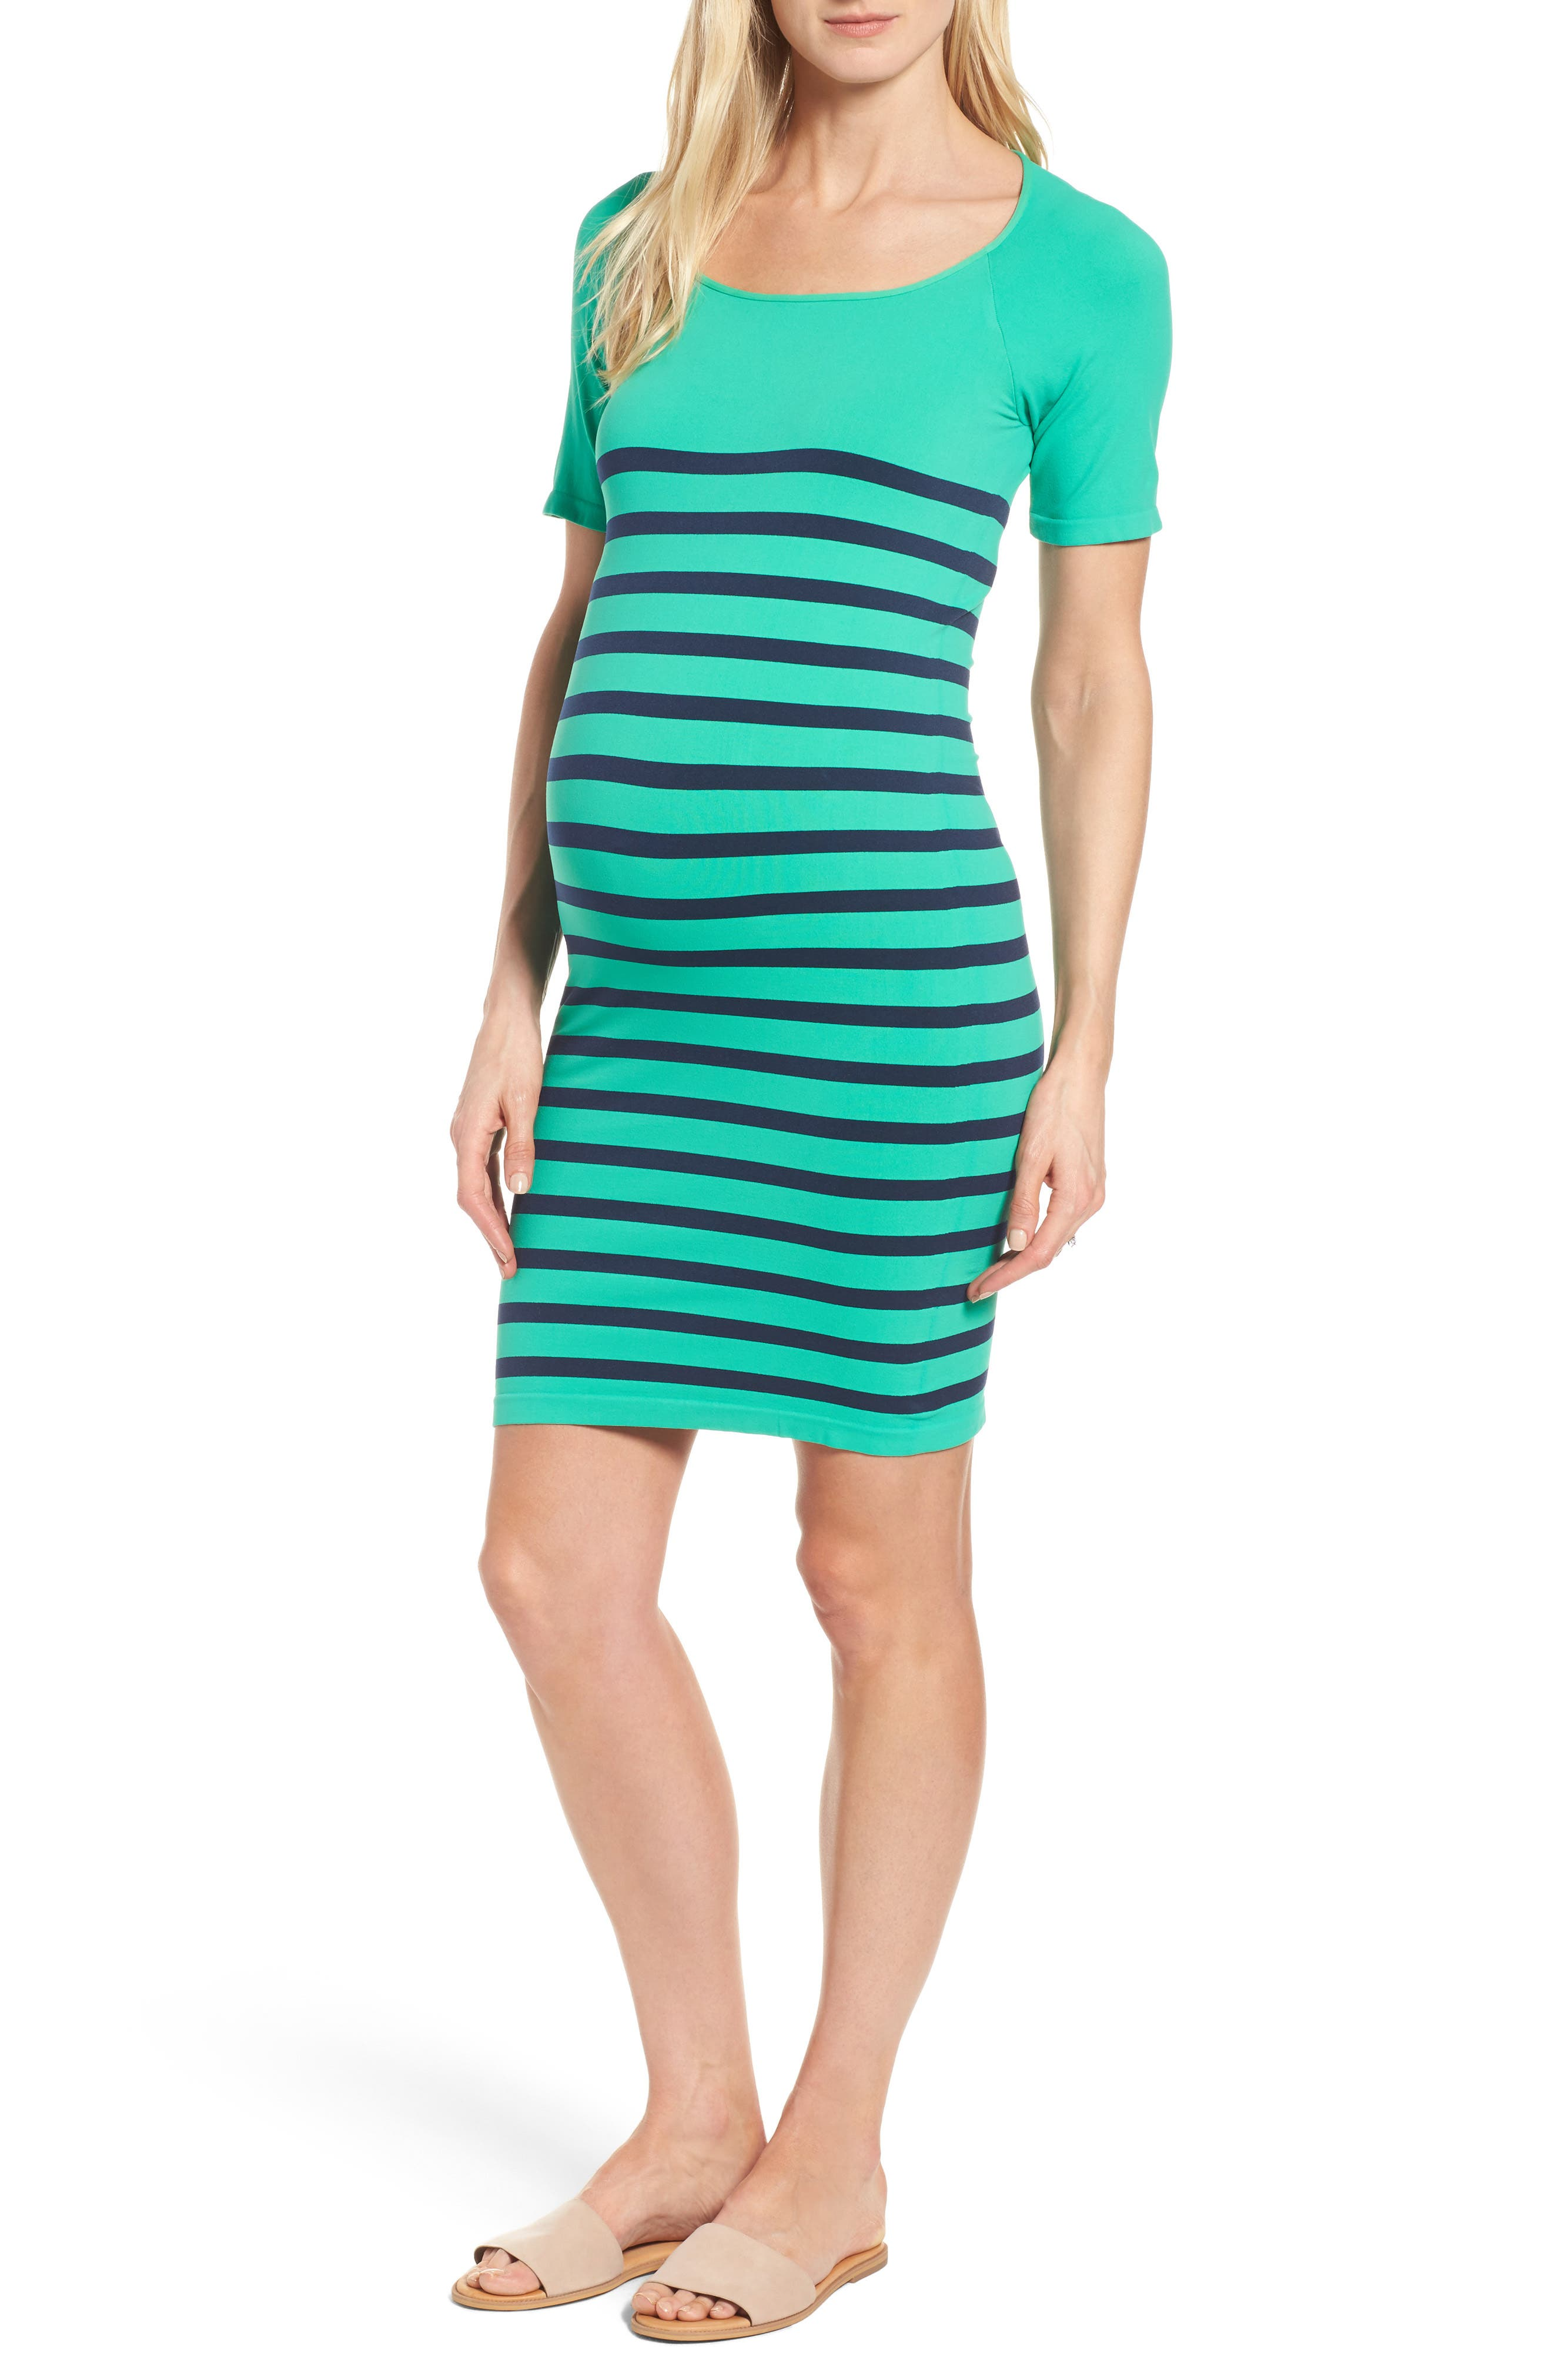 Tees by Tina 'Nautical' Short Sleeve Maternity Dress